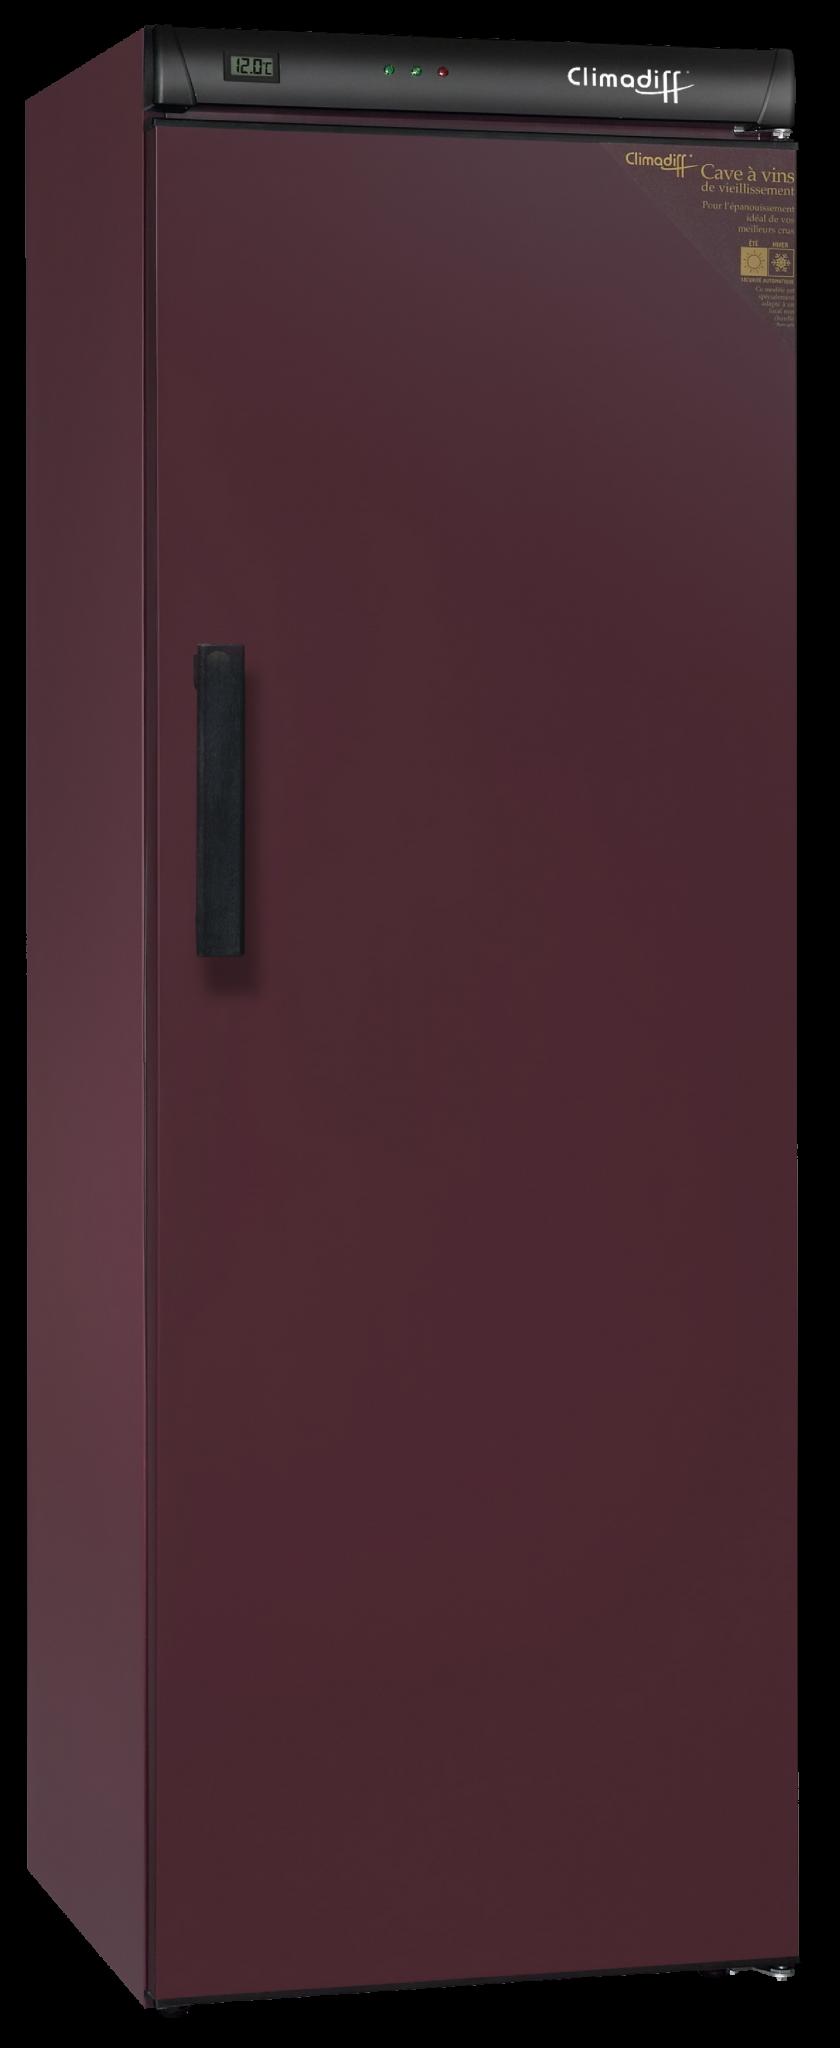 climadiff f s wine cabinet cvp270a wine cellar storage solutions. Black Bedroom Furniture Sets. Home Design Ideas